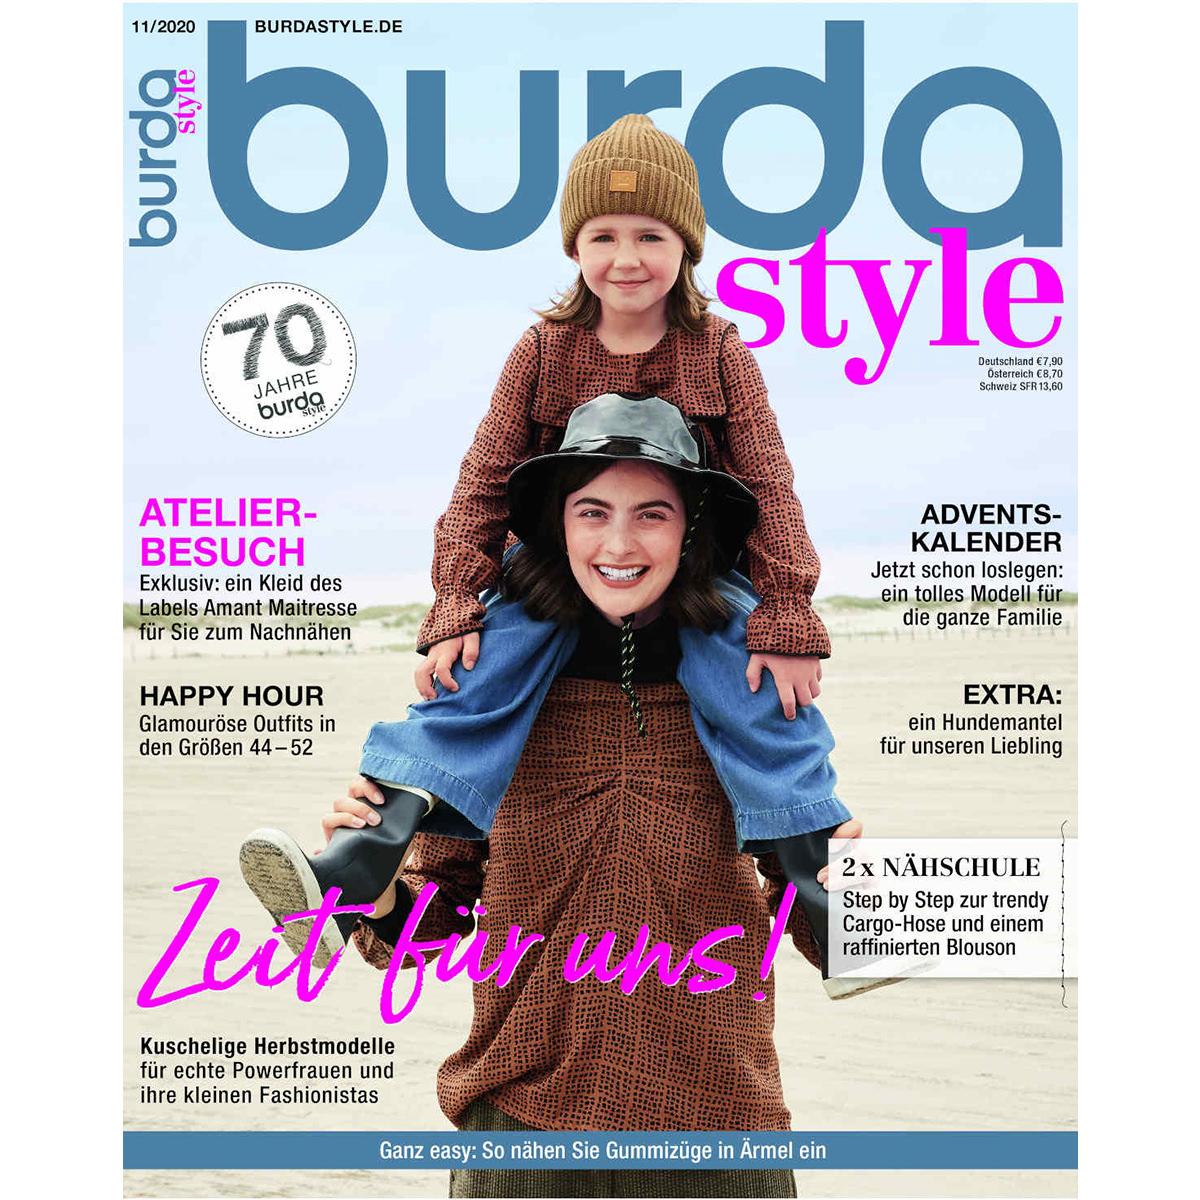 burda style Ausgabe November 2020